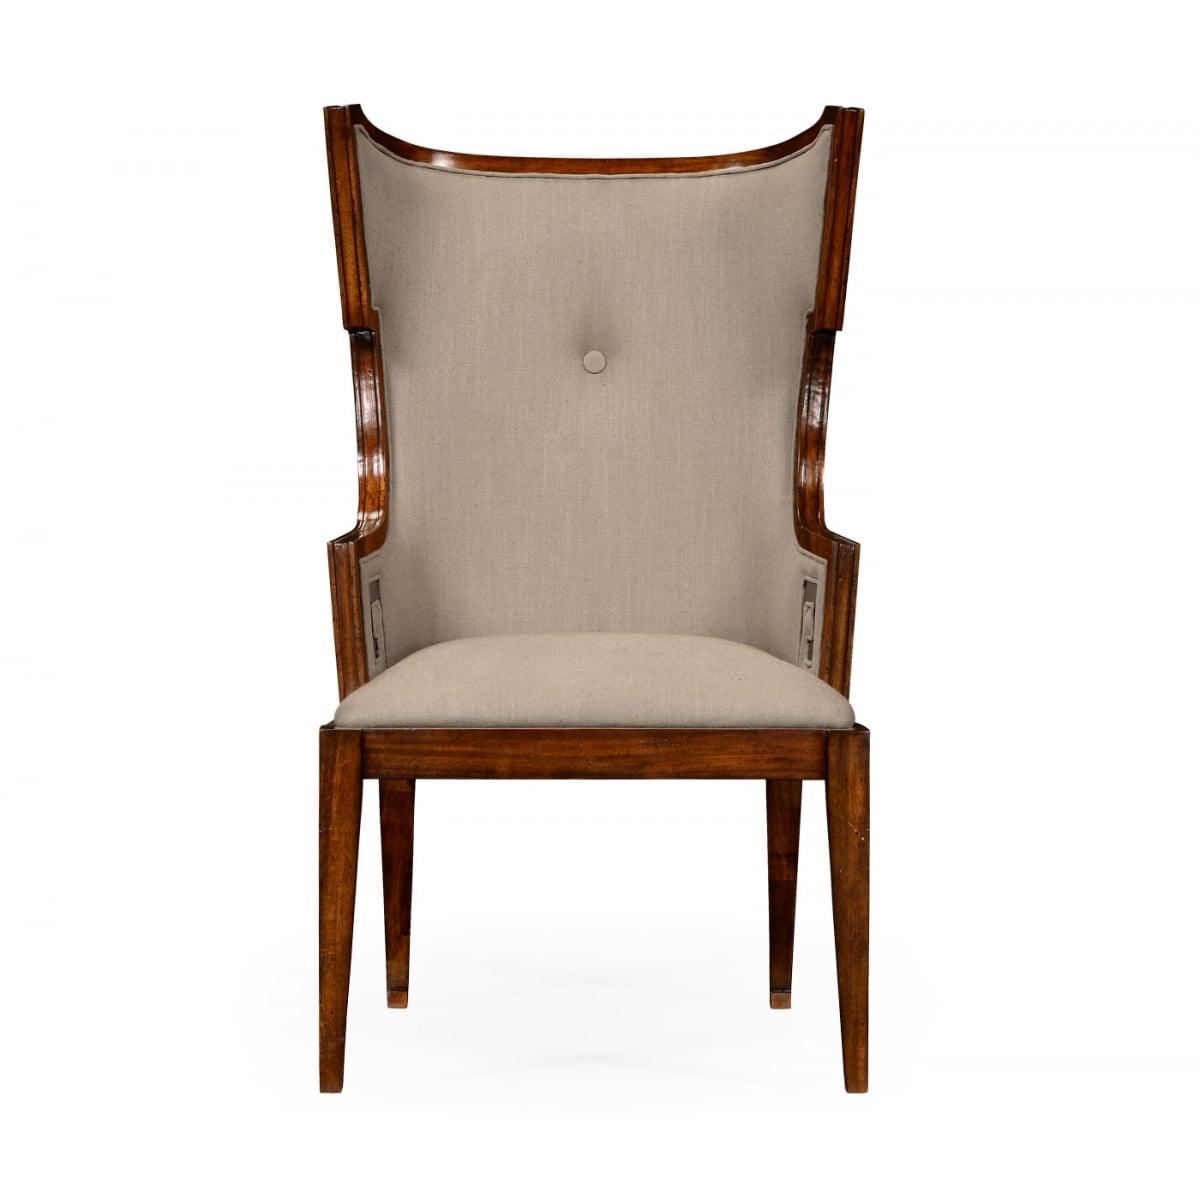 Designer Wing Chair Walnut Swanky Interiors